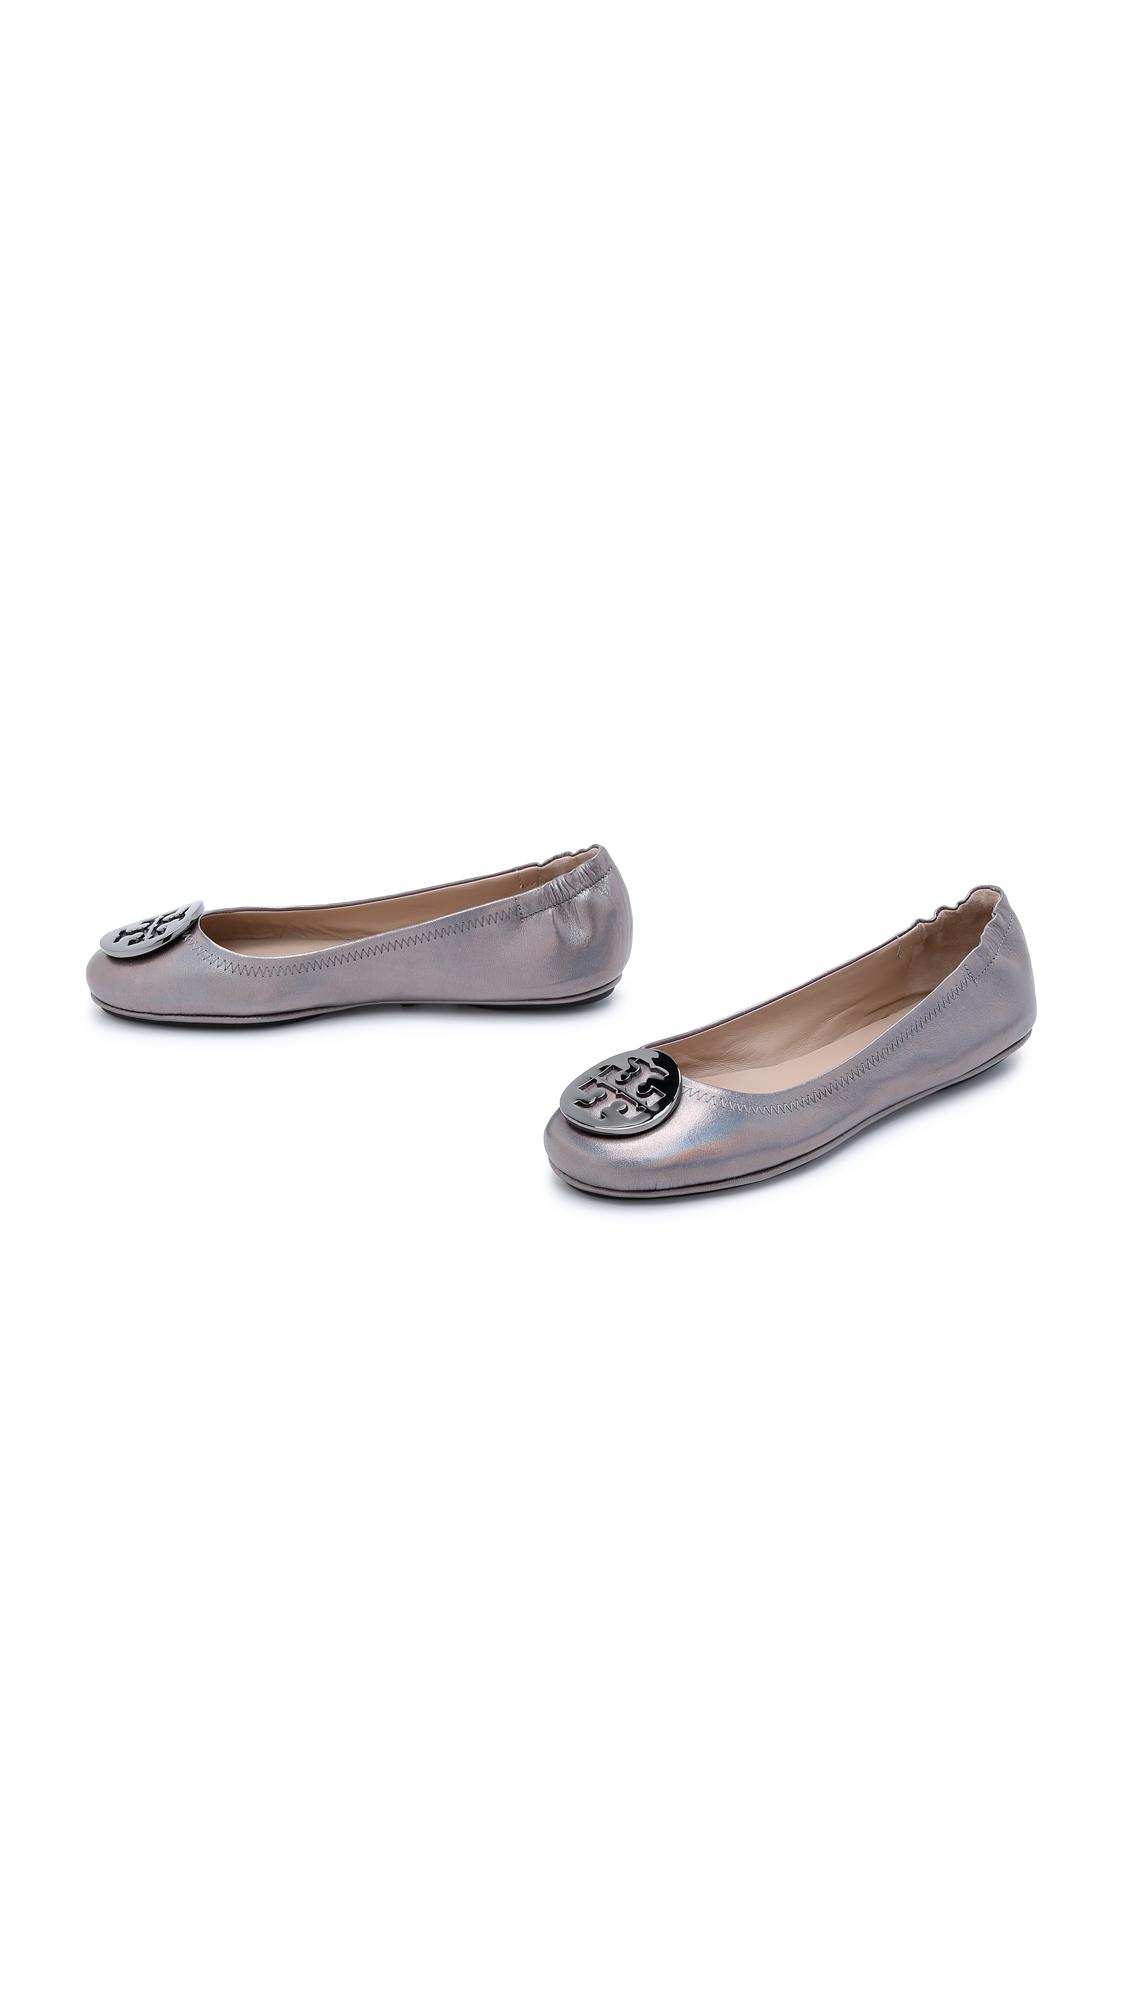 79fa62582 Tory Burch Minnie Travel Ballet Flats - Gunmetal in Gray - Lyst